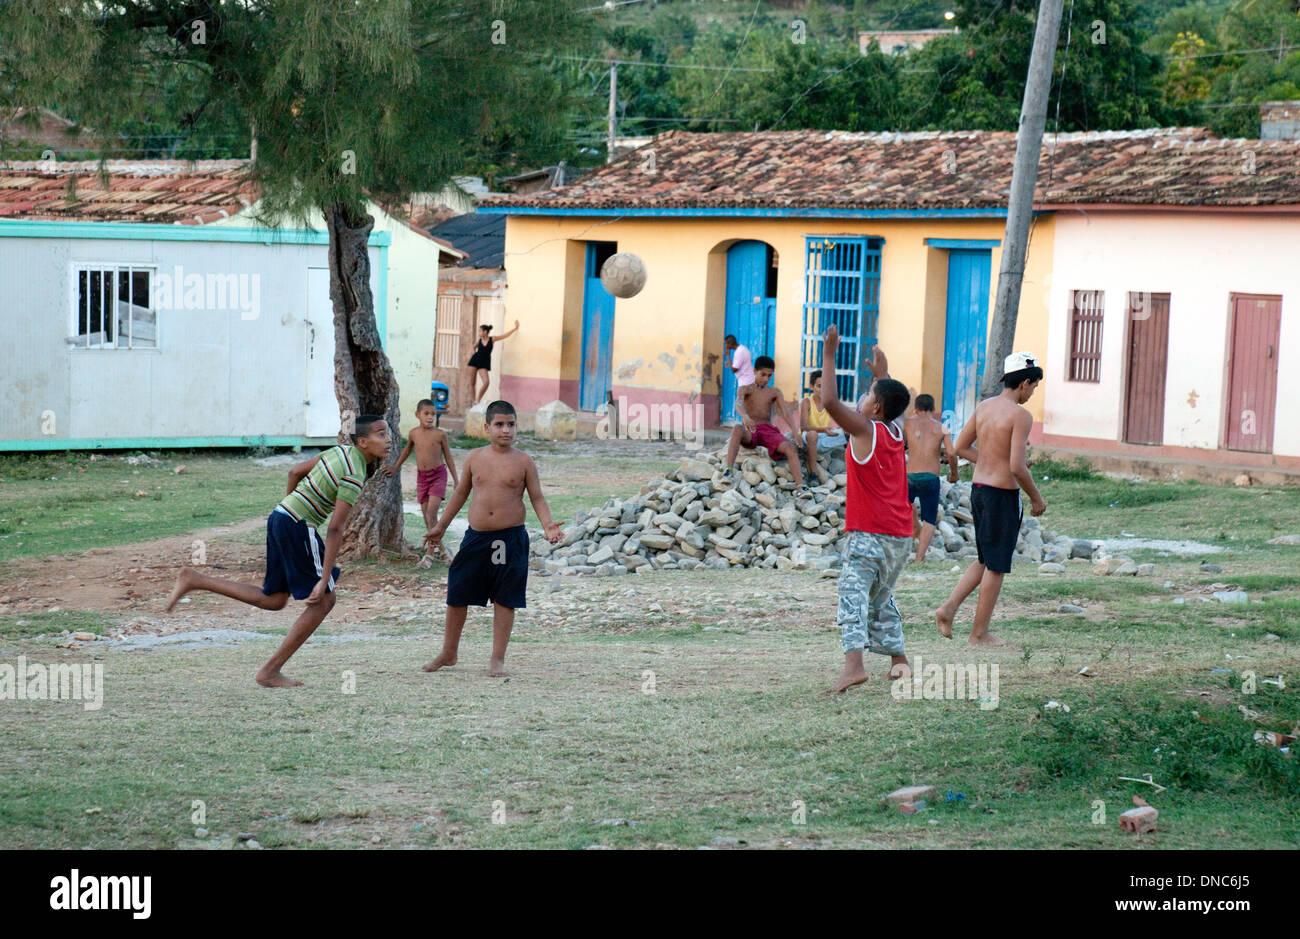 Lions Soccer Team Caribbean Cuba